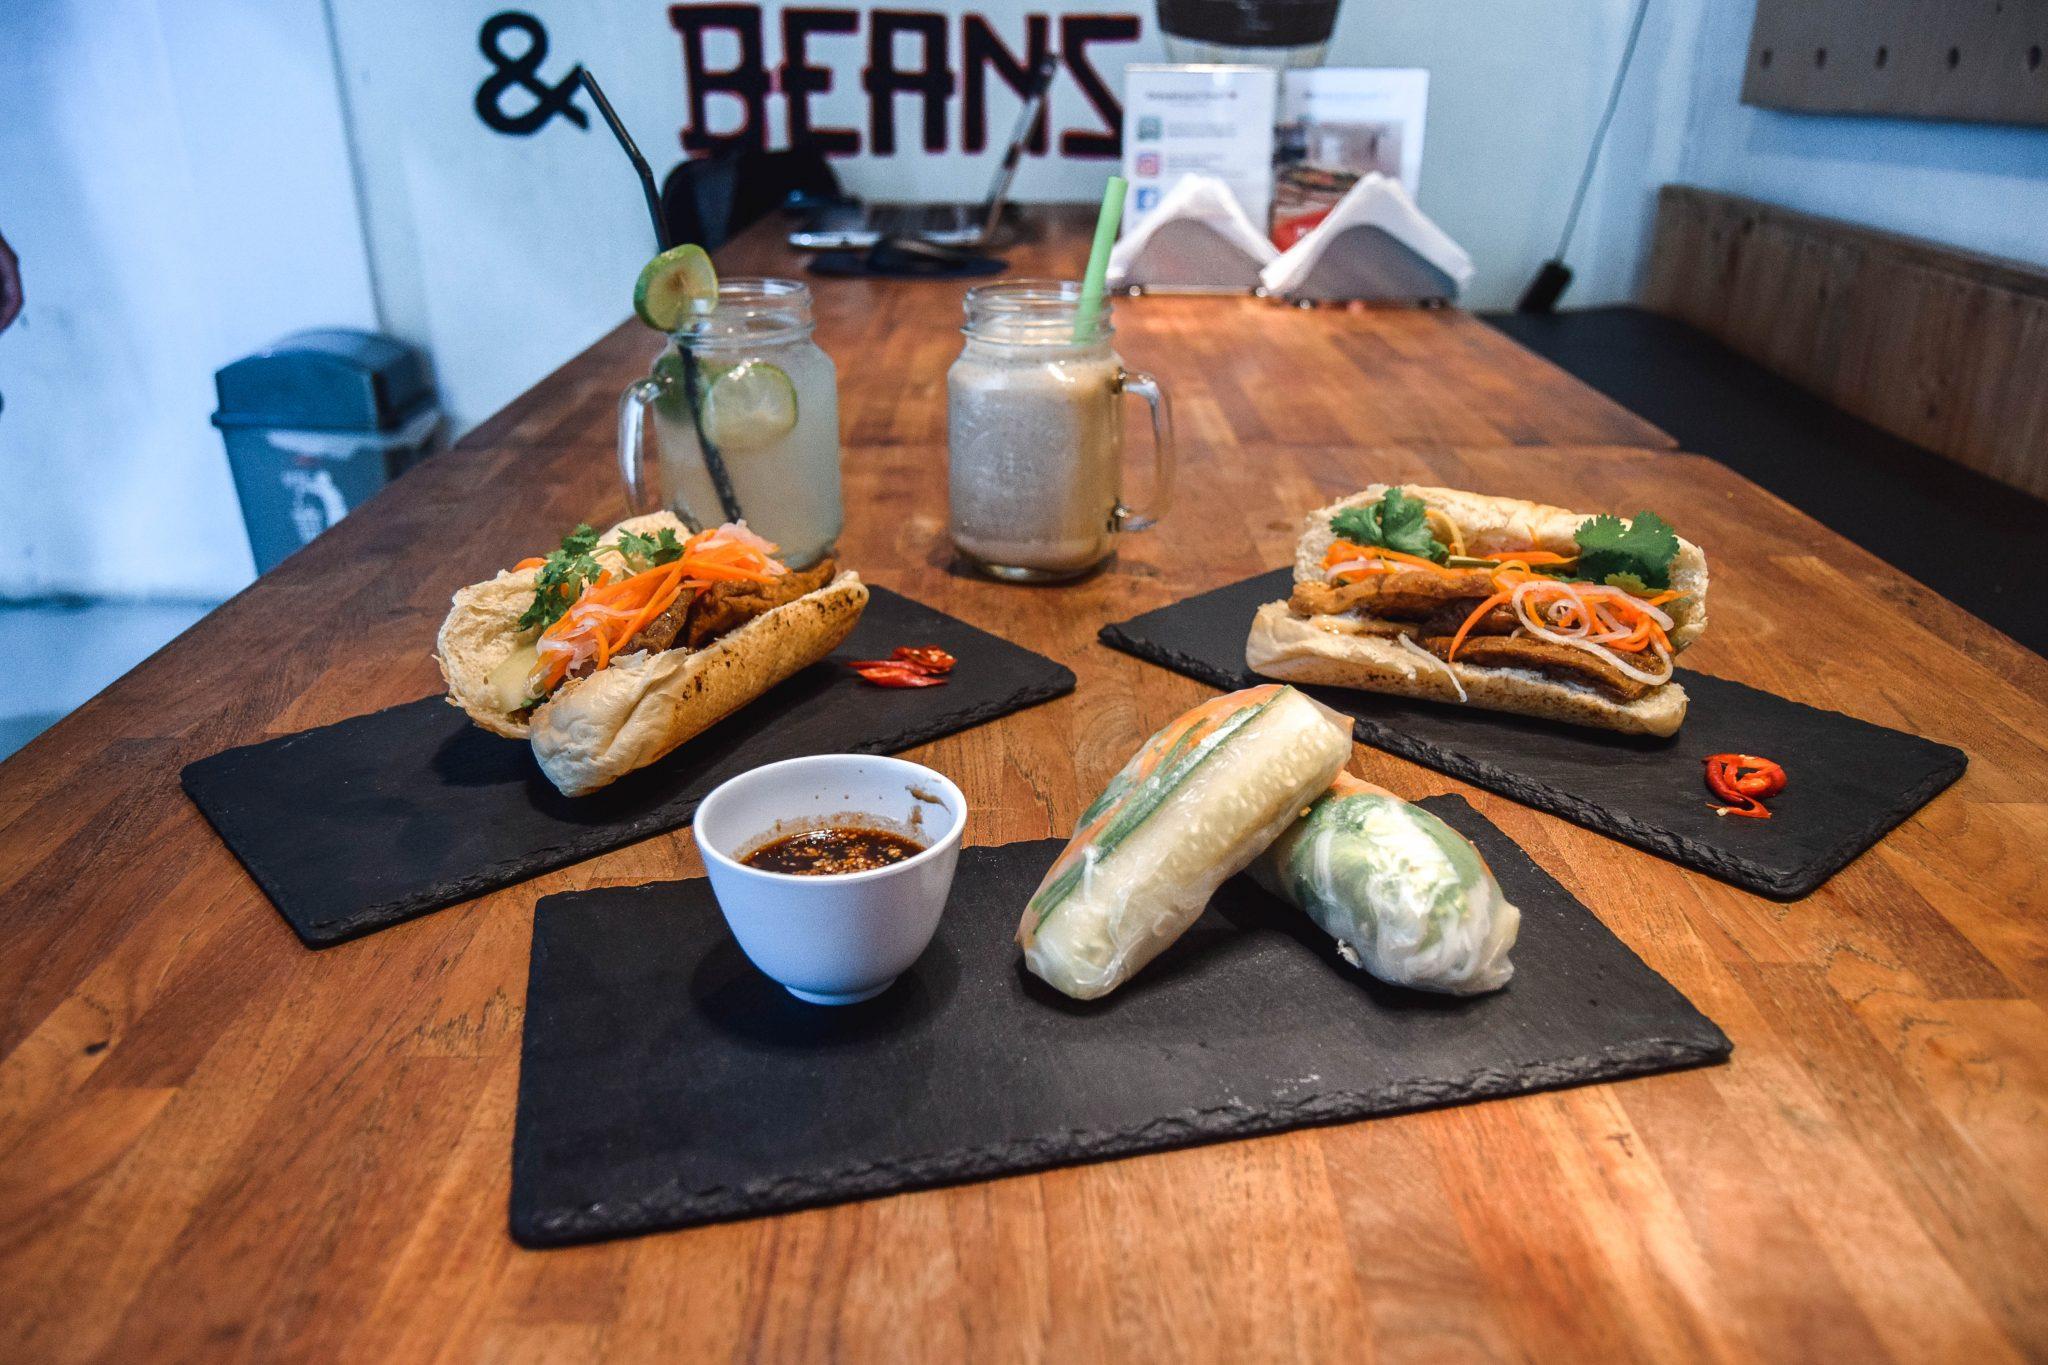 Wanderers & Warriors - Bahn Mi & Beans Canggu Bali - Best Restaurants In Bali Restaurants - Best Restaurants In Canggu